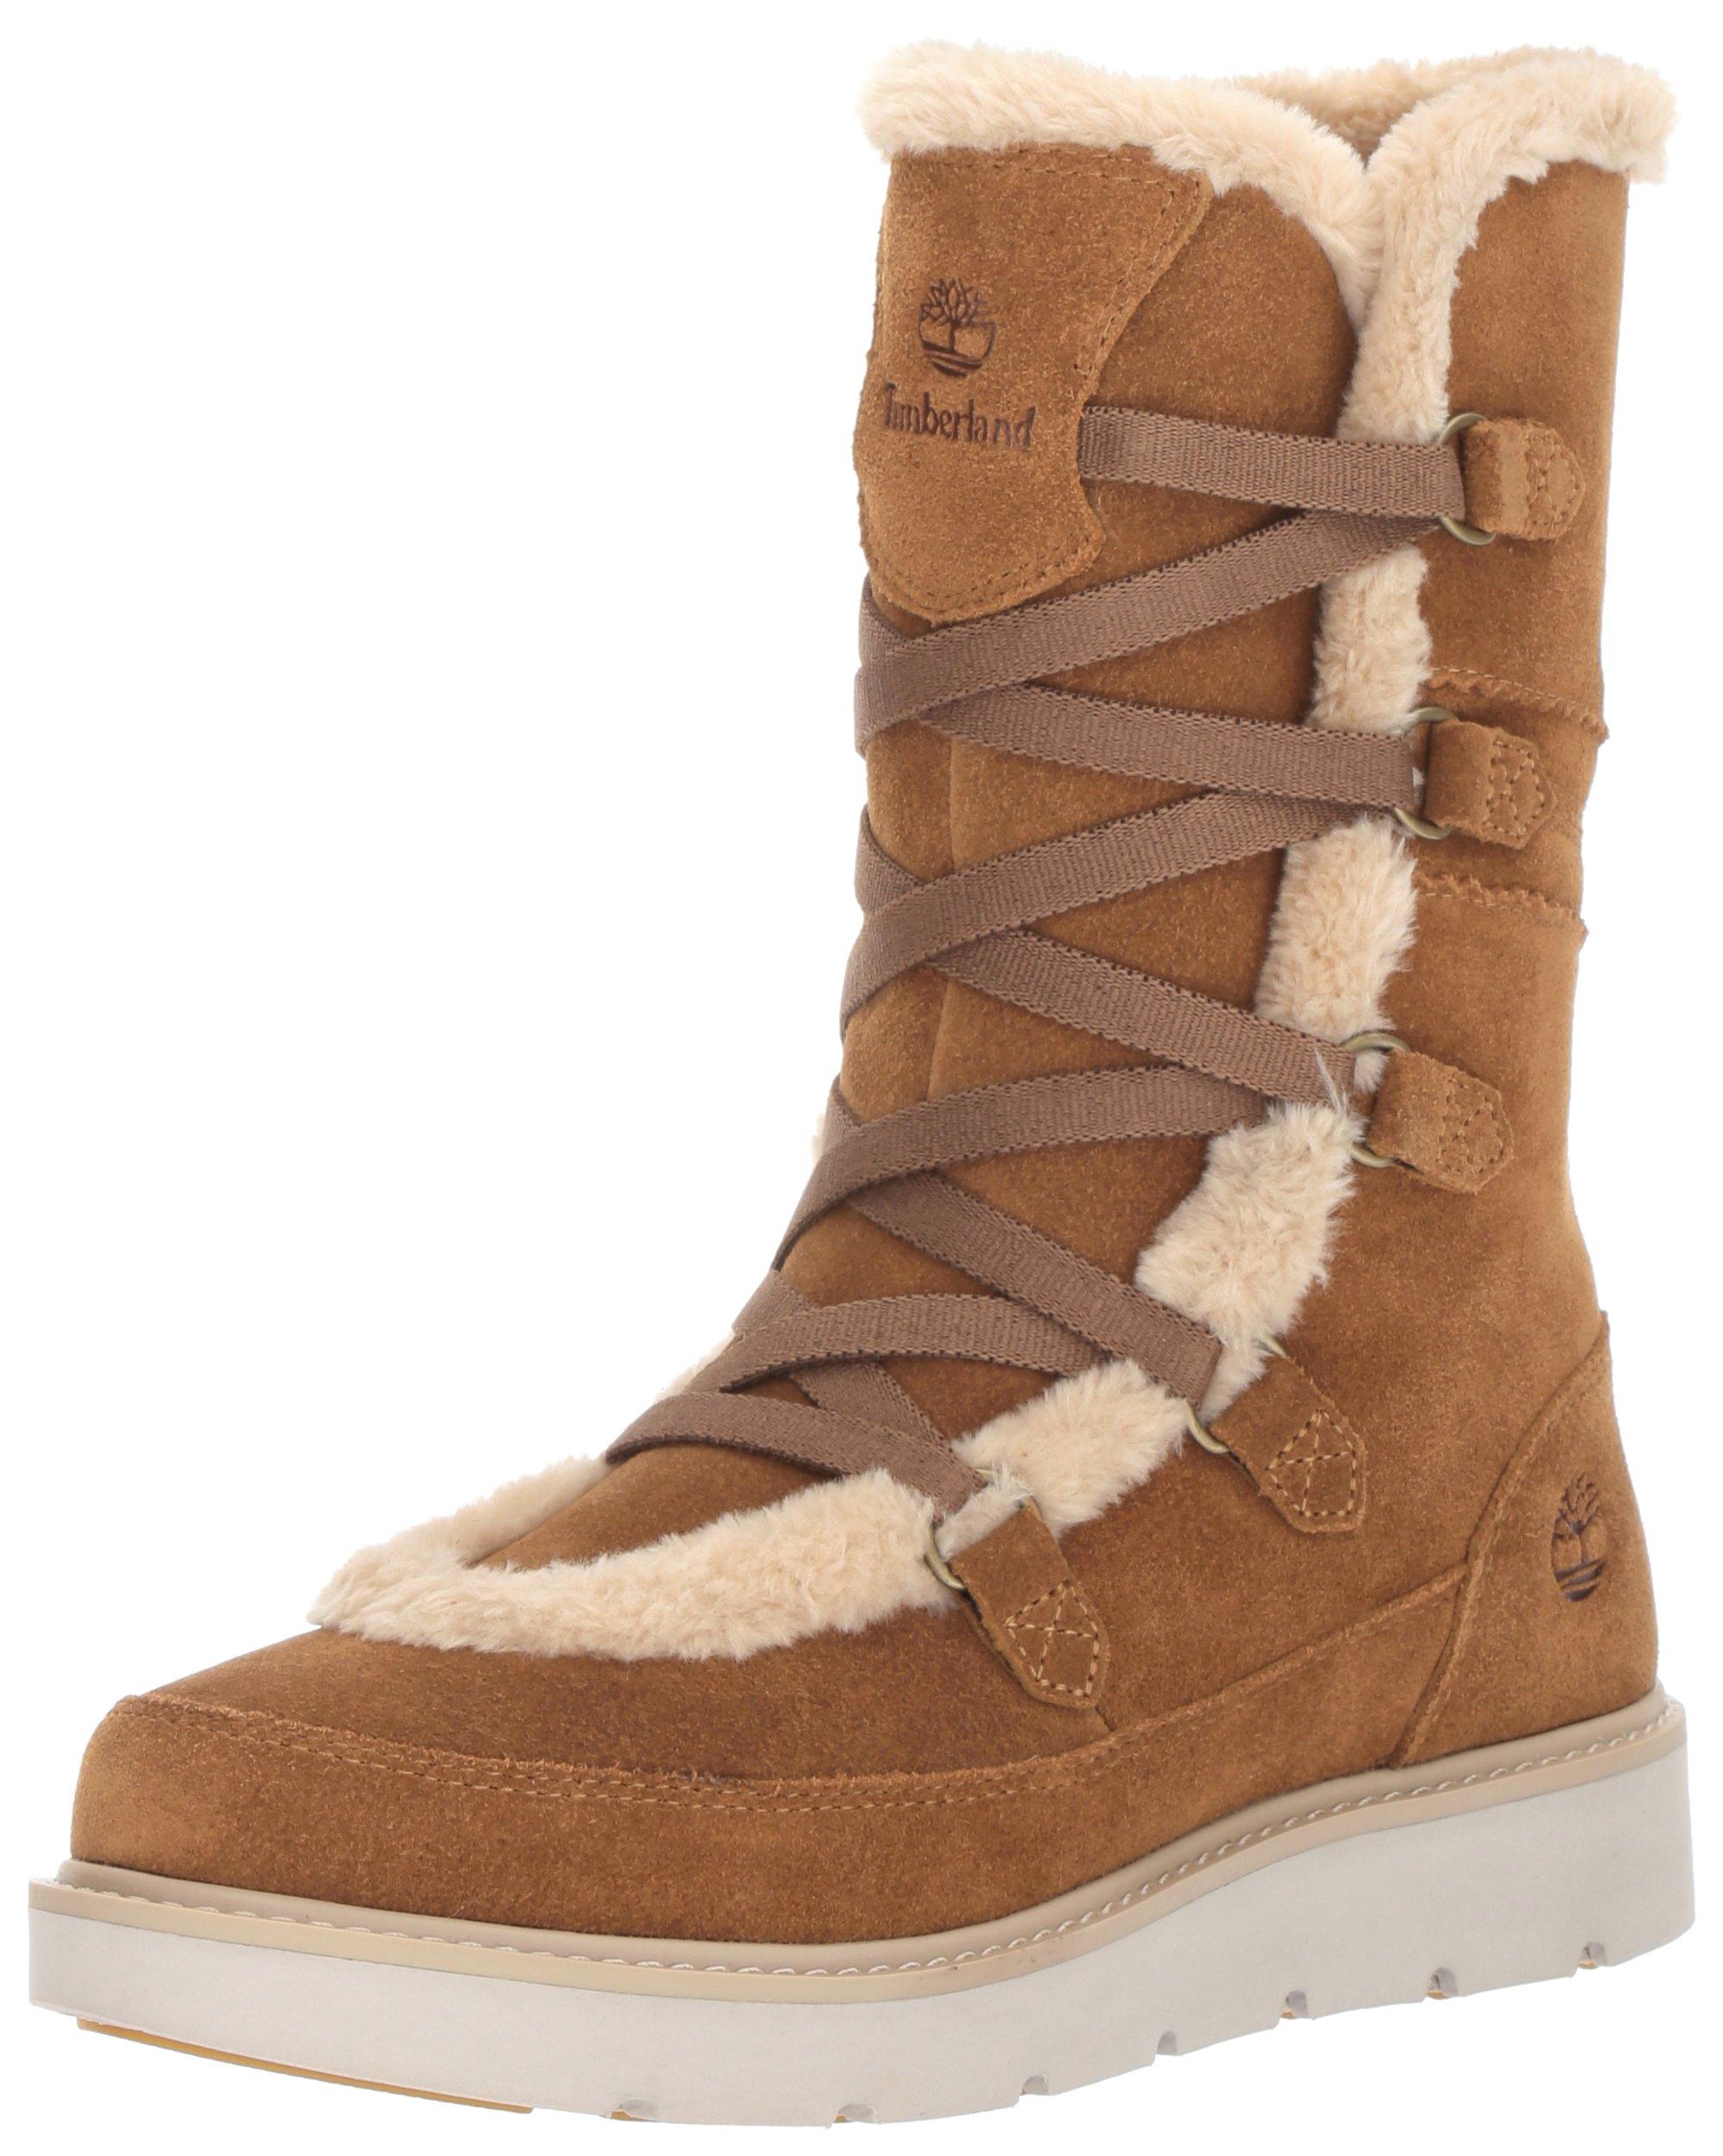 Timberland Women's Kenniston Muk Tall Winter Boot, Medium Brown, 8 C US